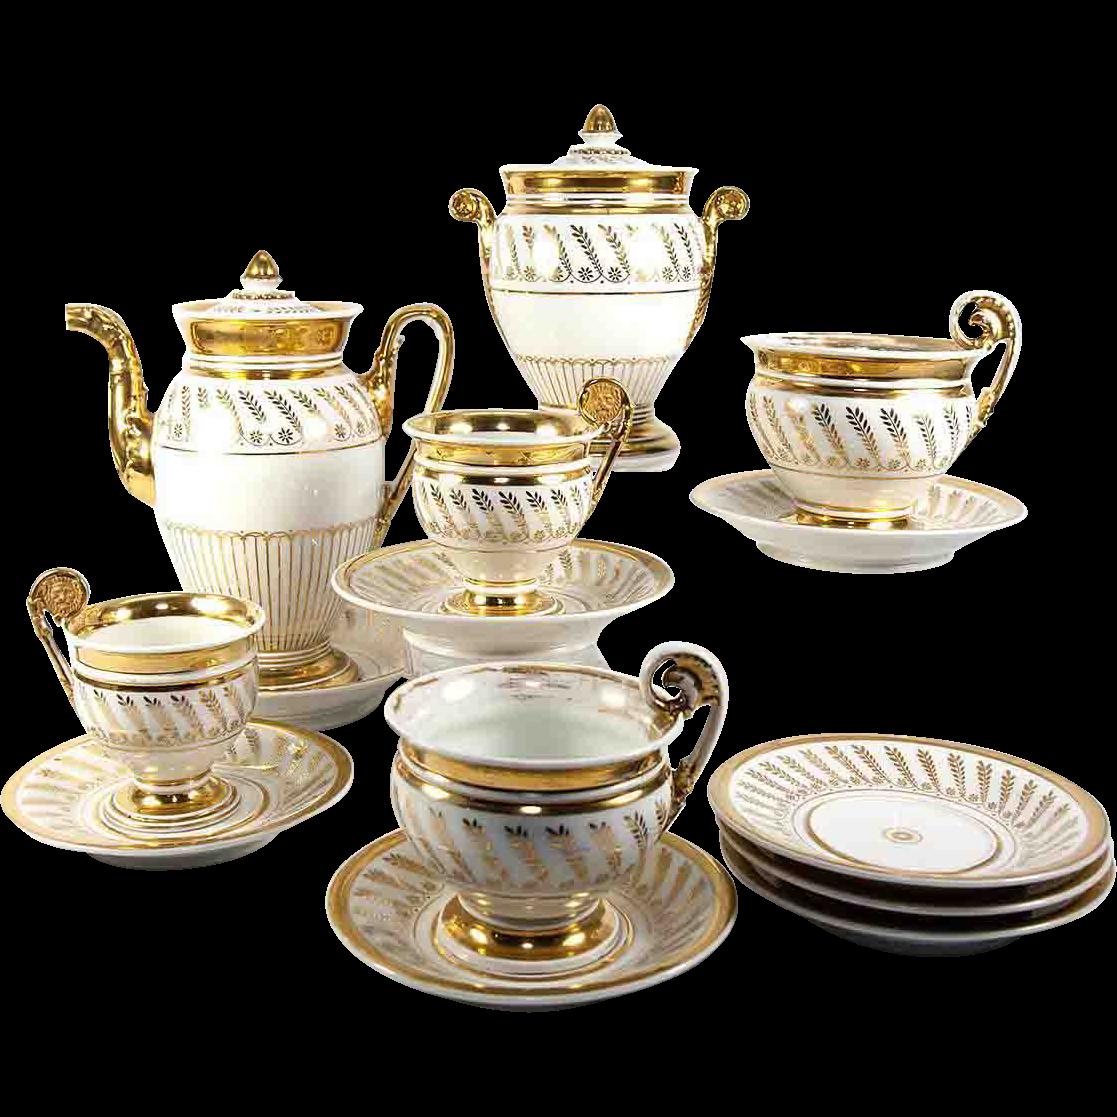 Fab Antique French Old Paris Porcelain French Empire Era